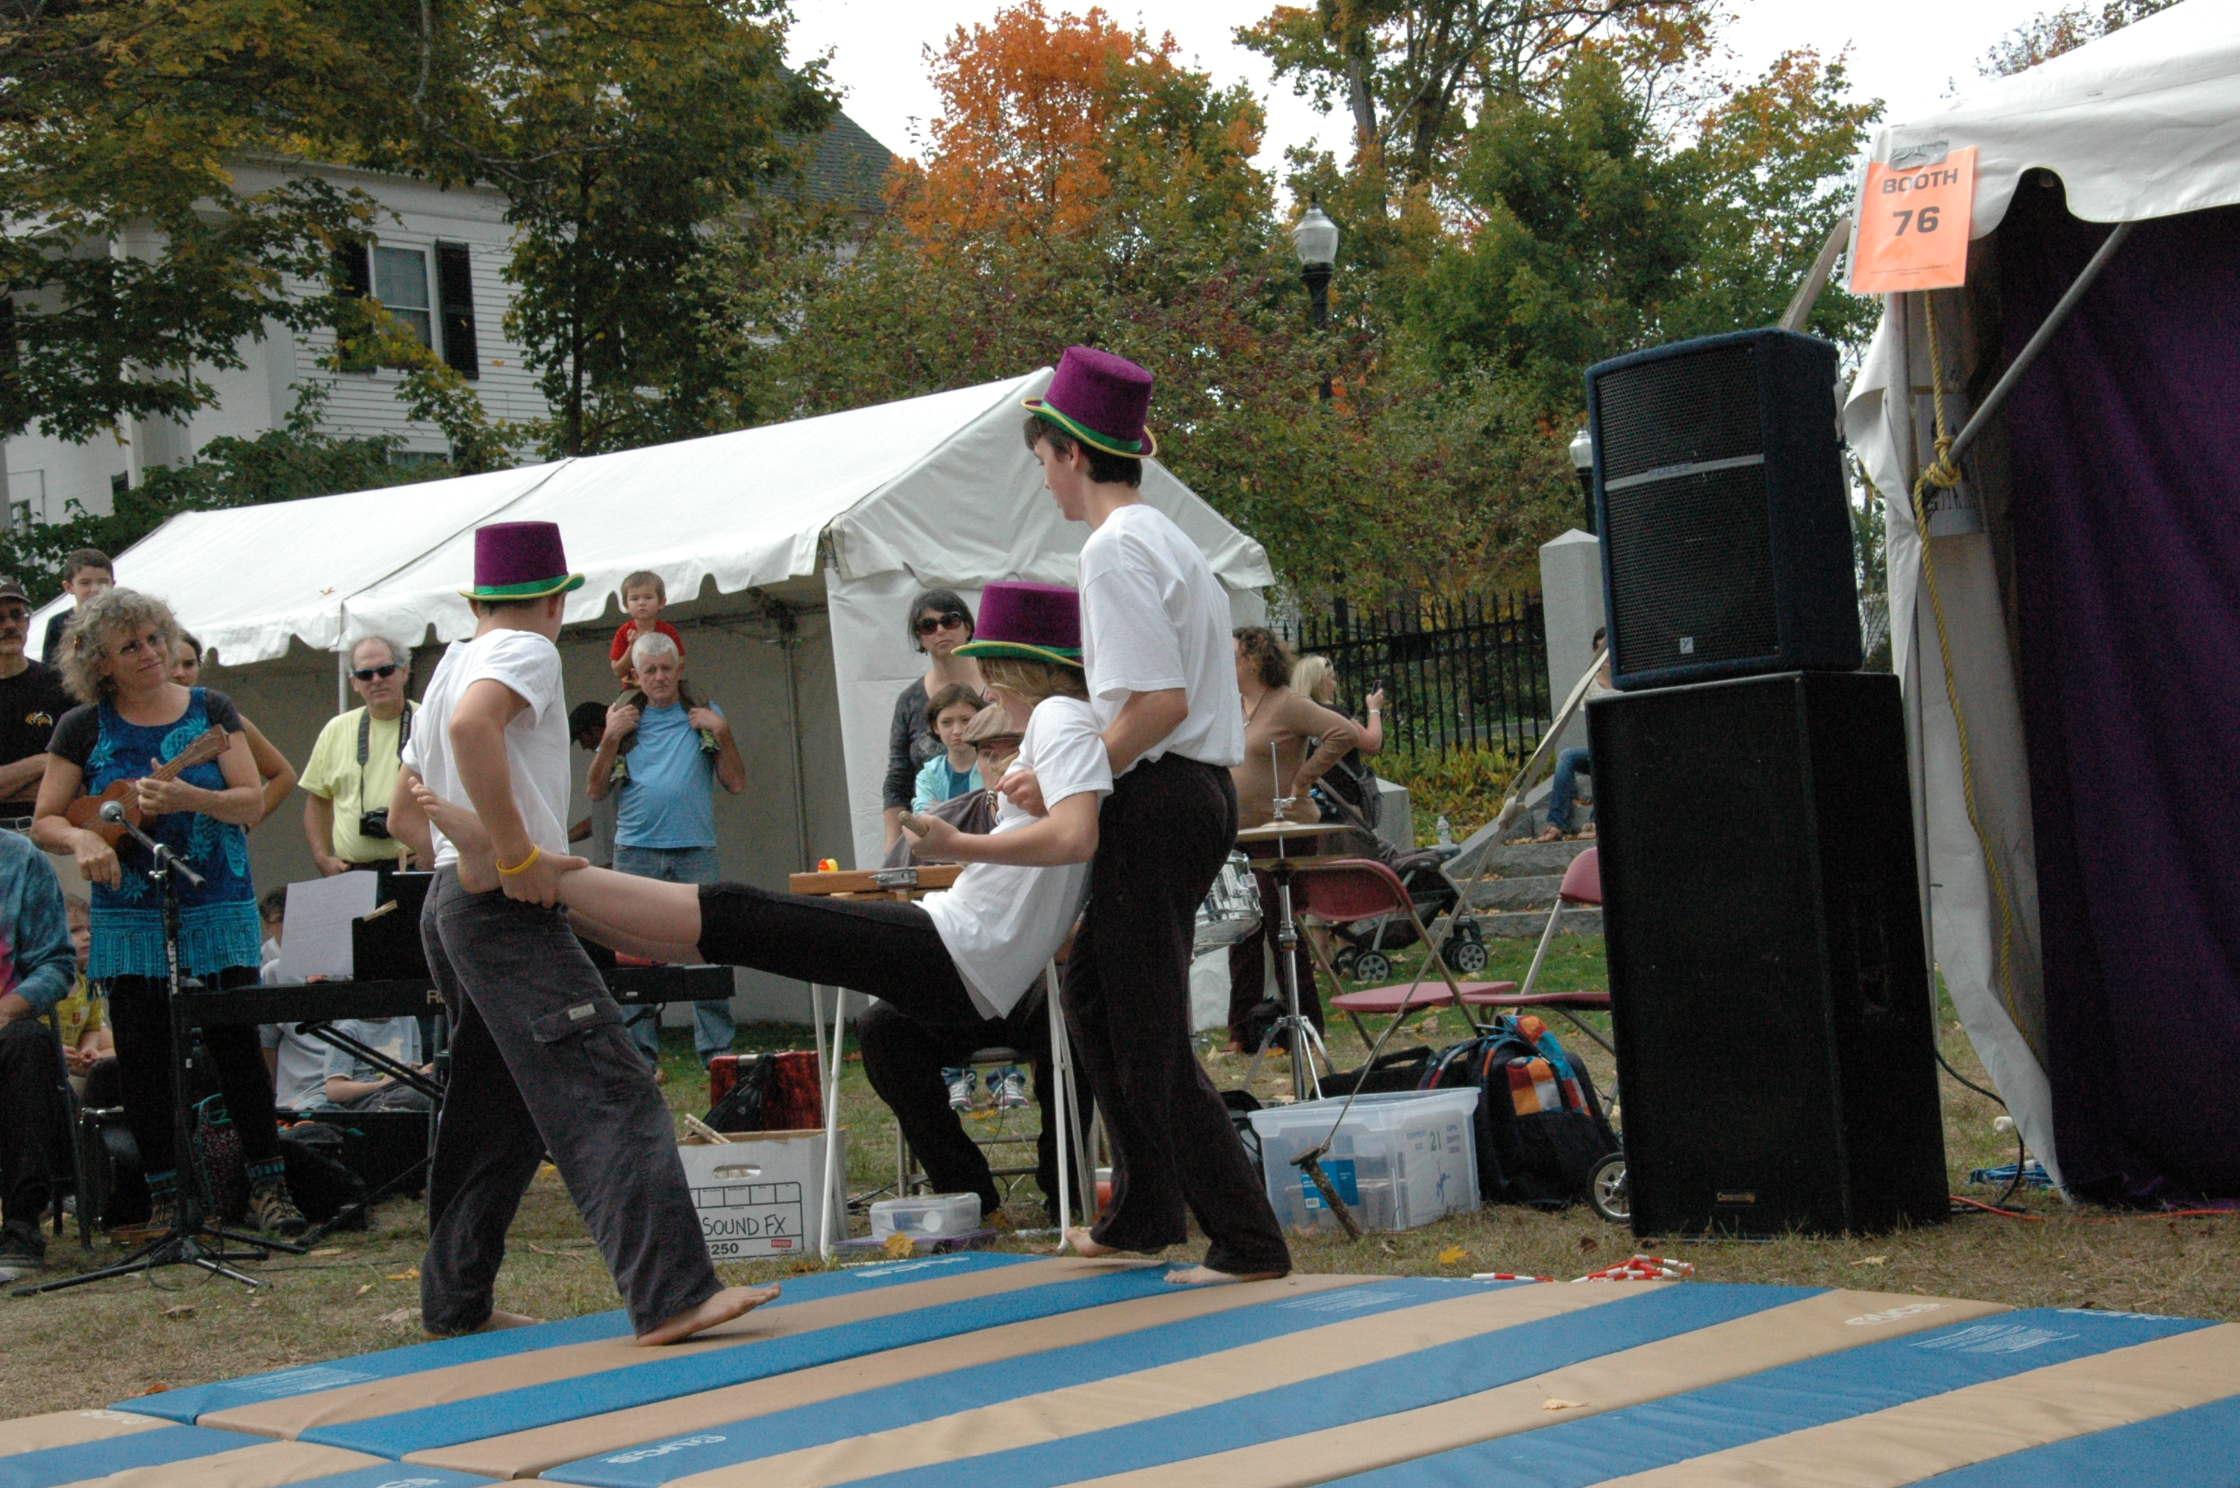 2012-10-06 Flyin Gravity Circus - Pumpkin 114.JPG